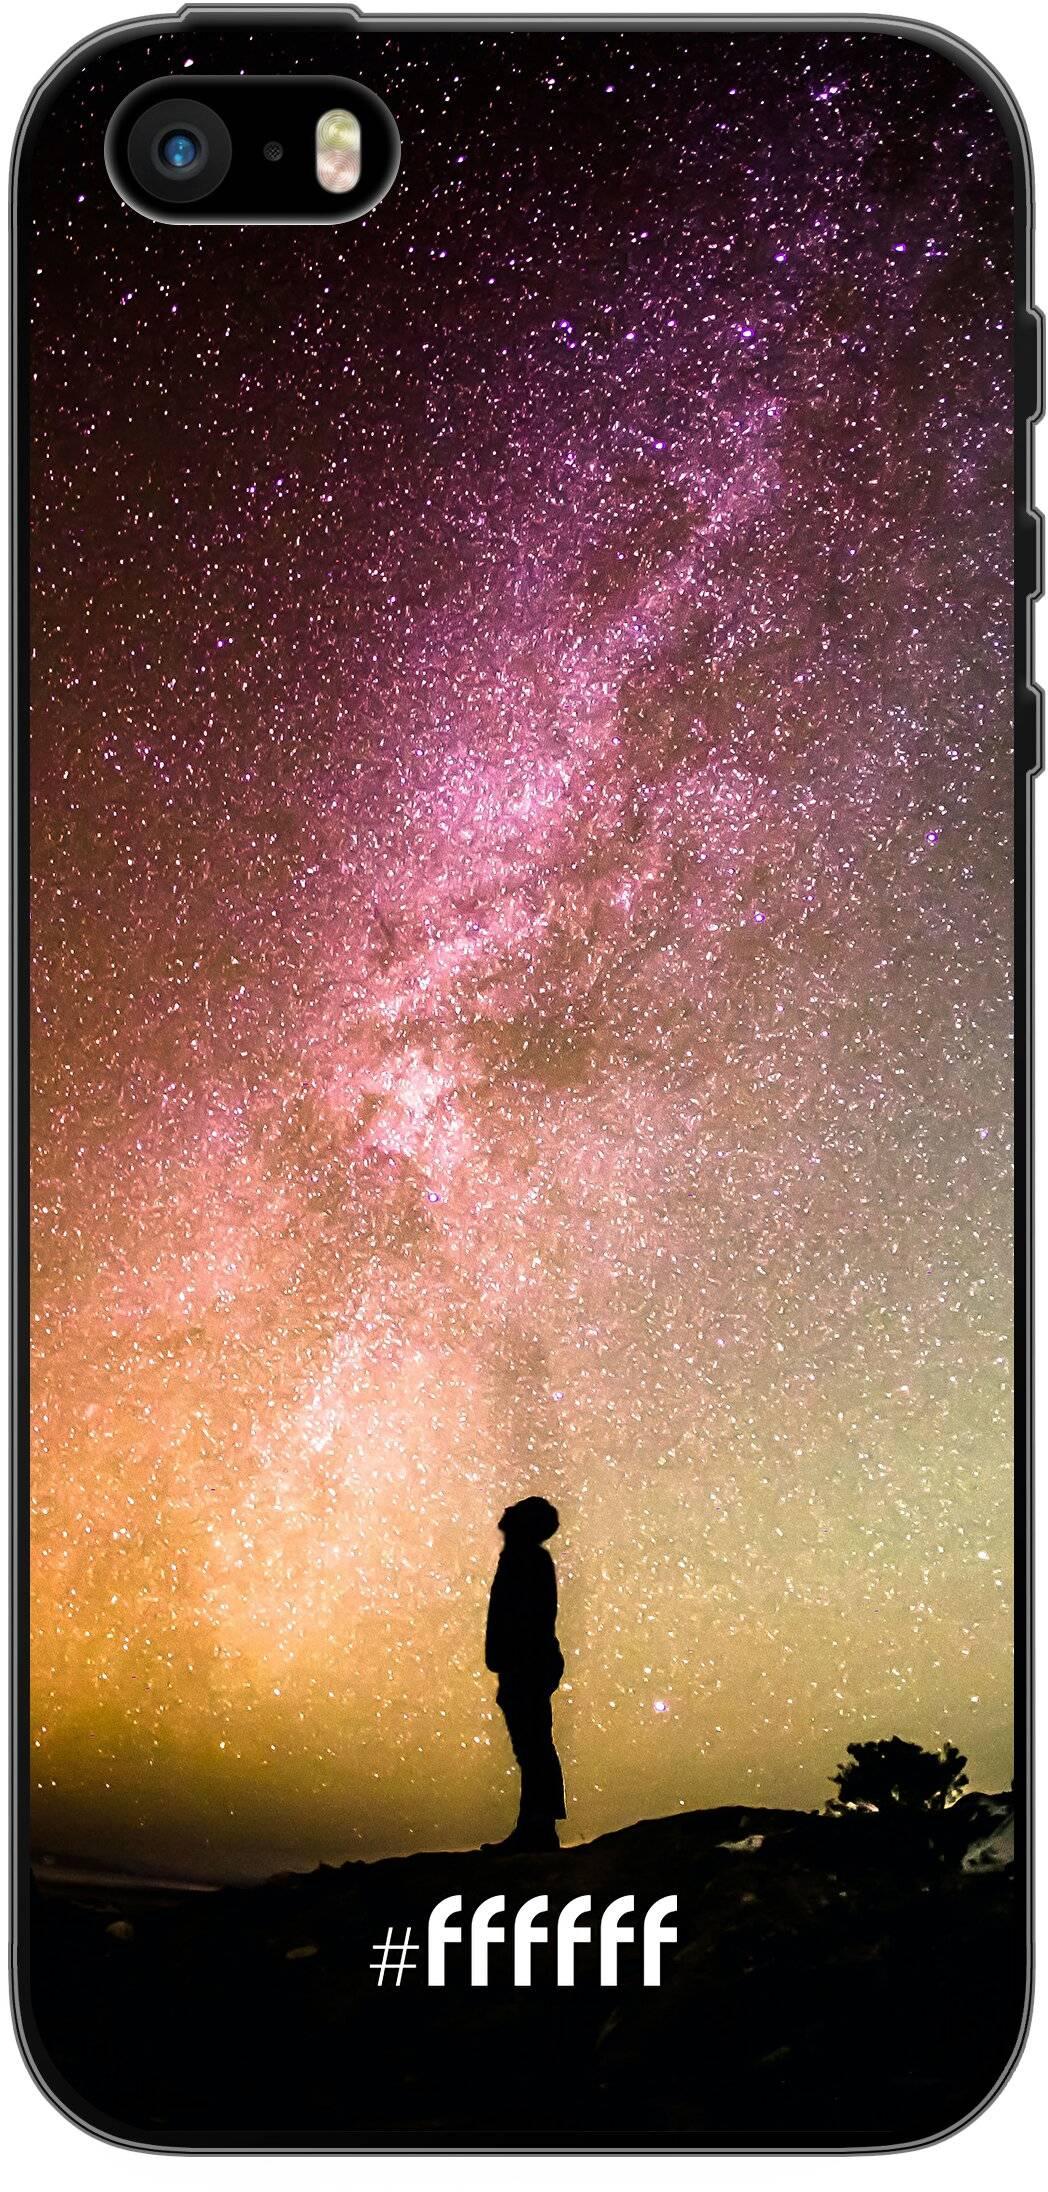 Watching the Stars iPhone 5